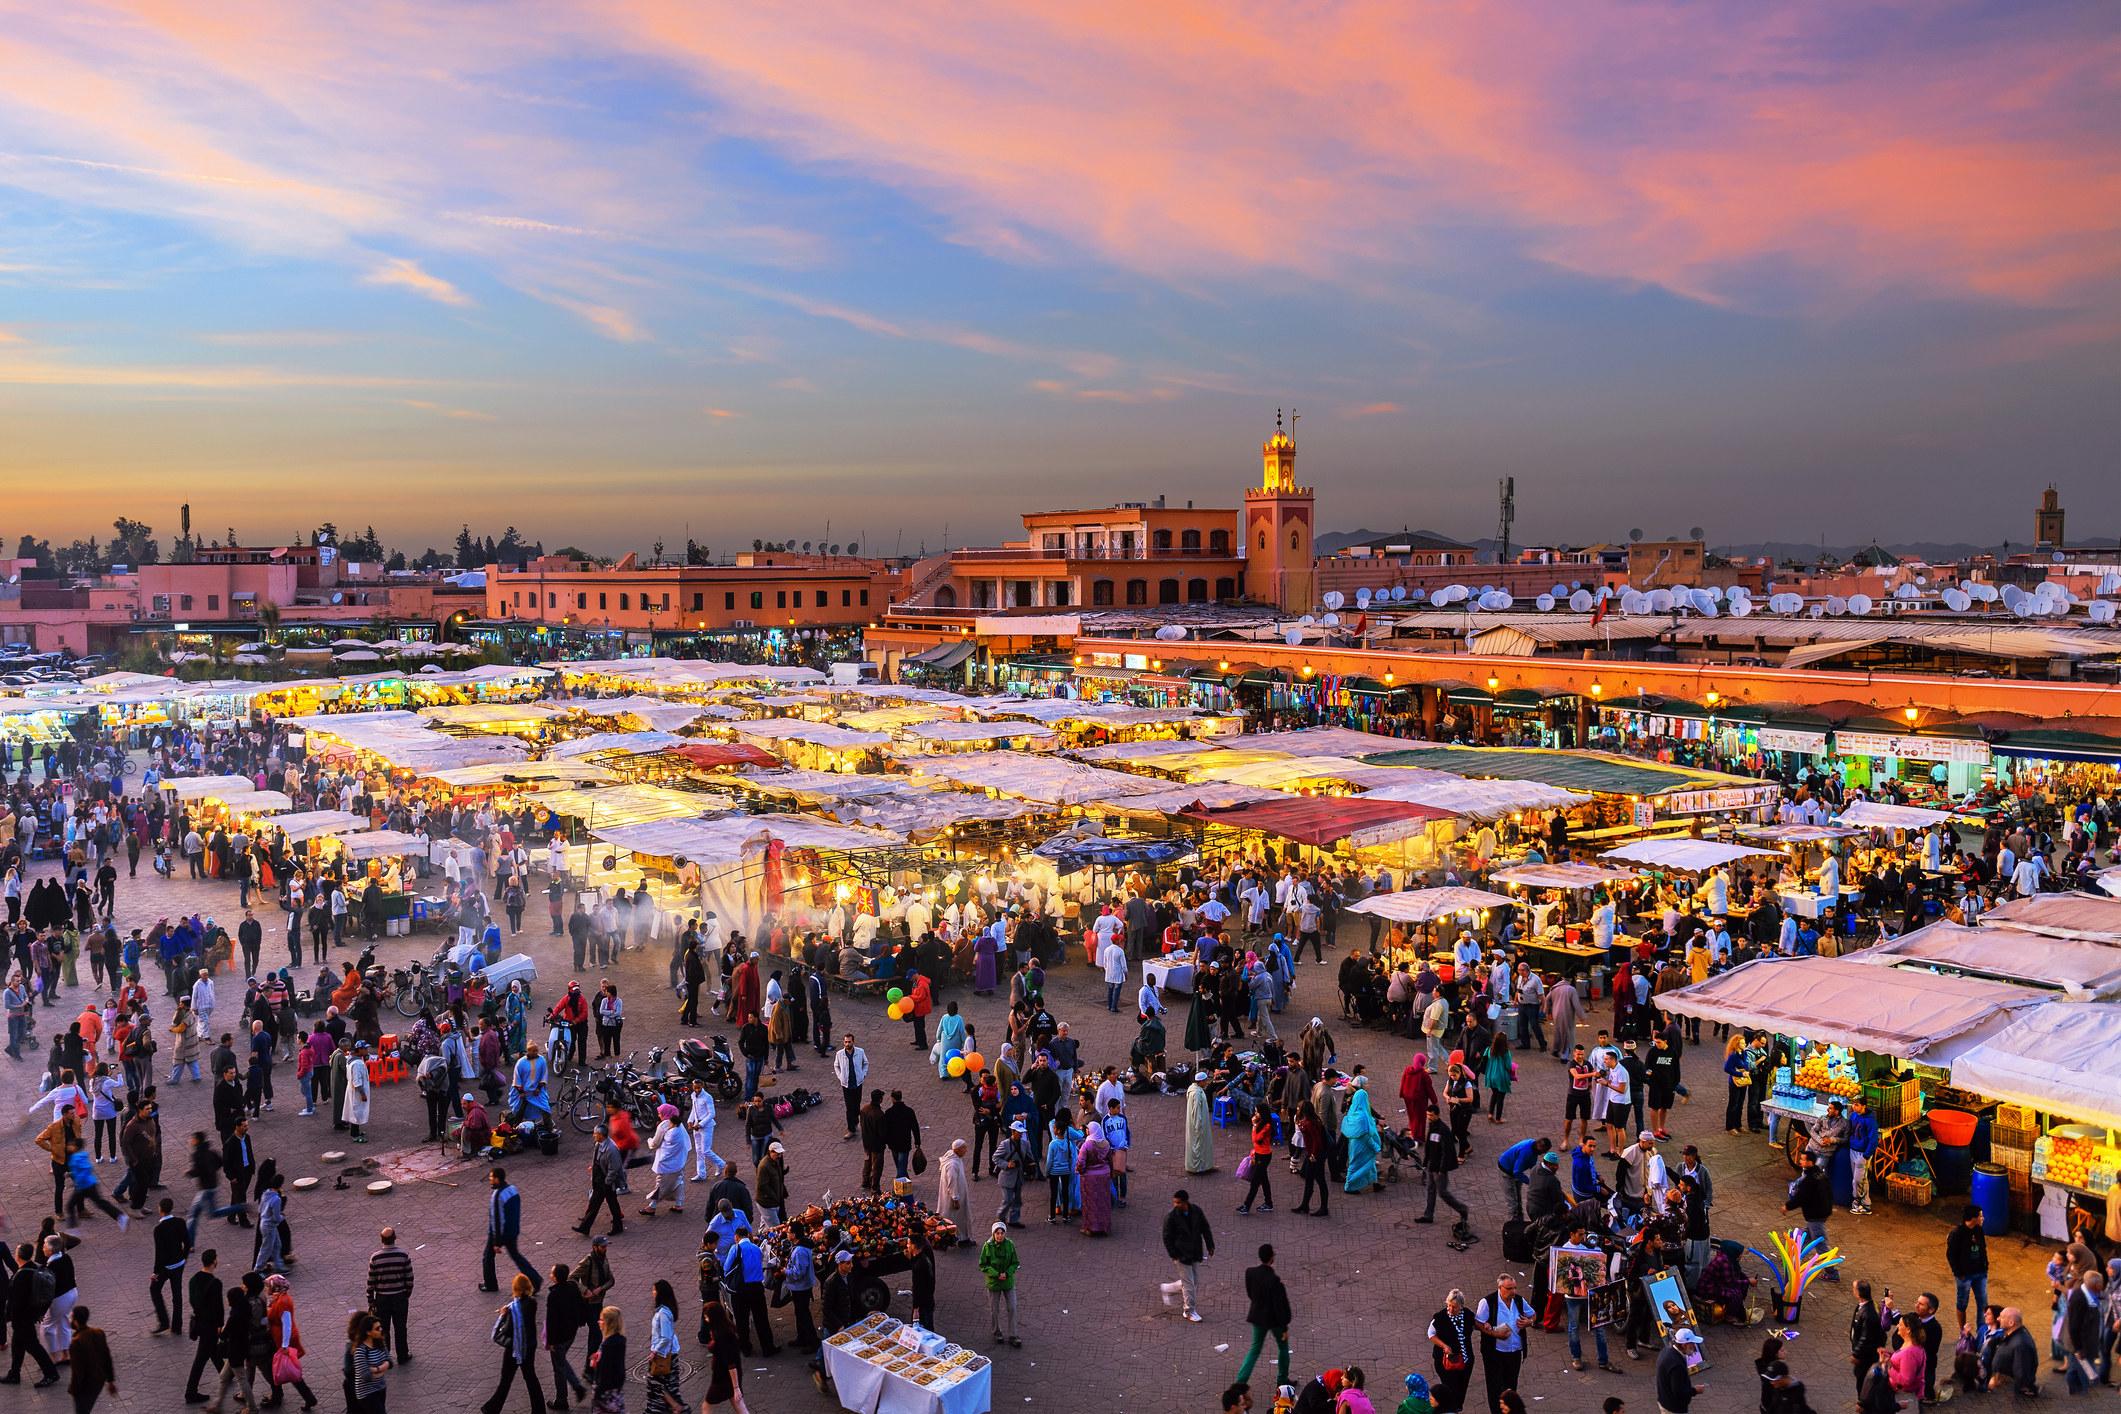 The main market square in Marrakesh